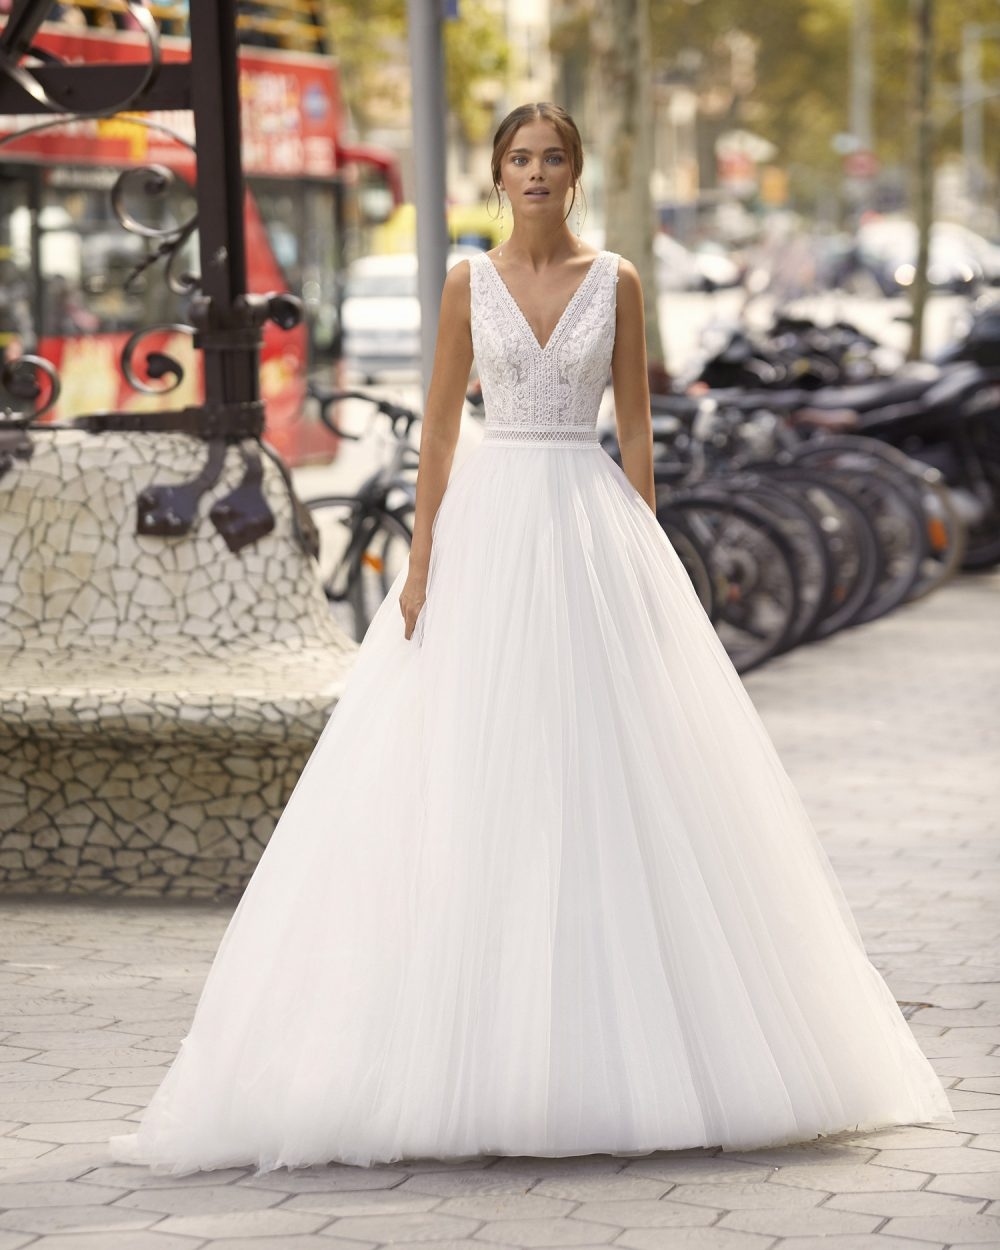 Mariages: abito da sposa Rosa Clarà 2021 a Vicenza, Verona, Padova, Veneto 5S135 YASMIN